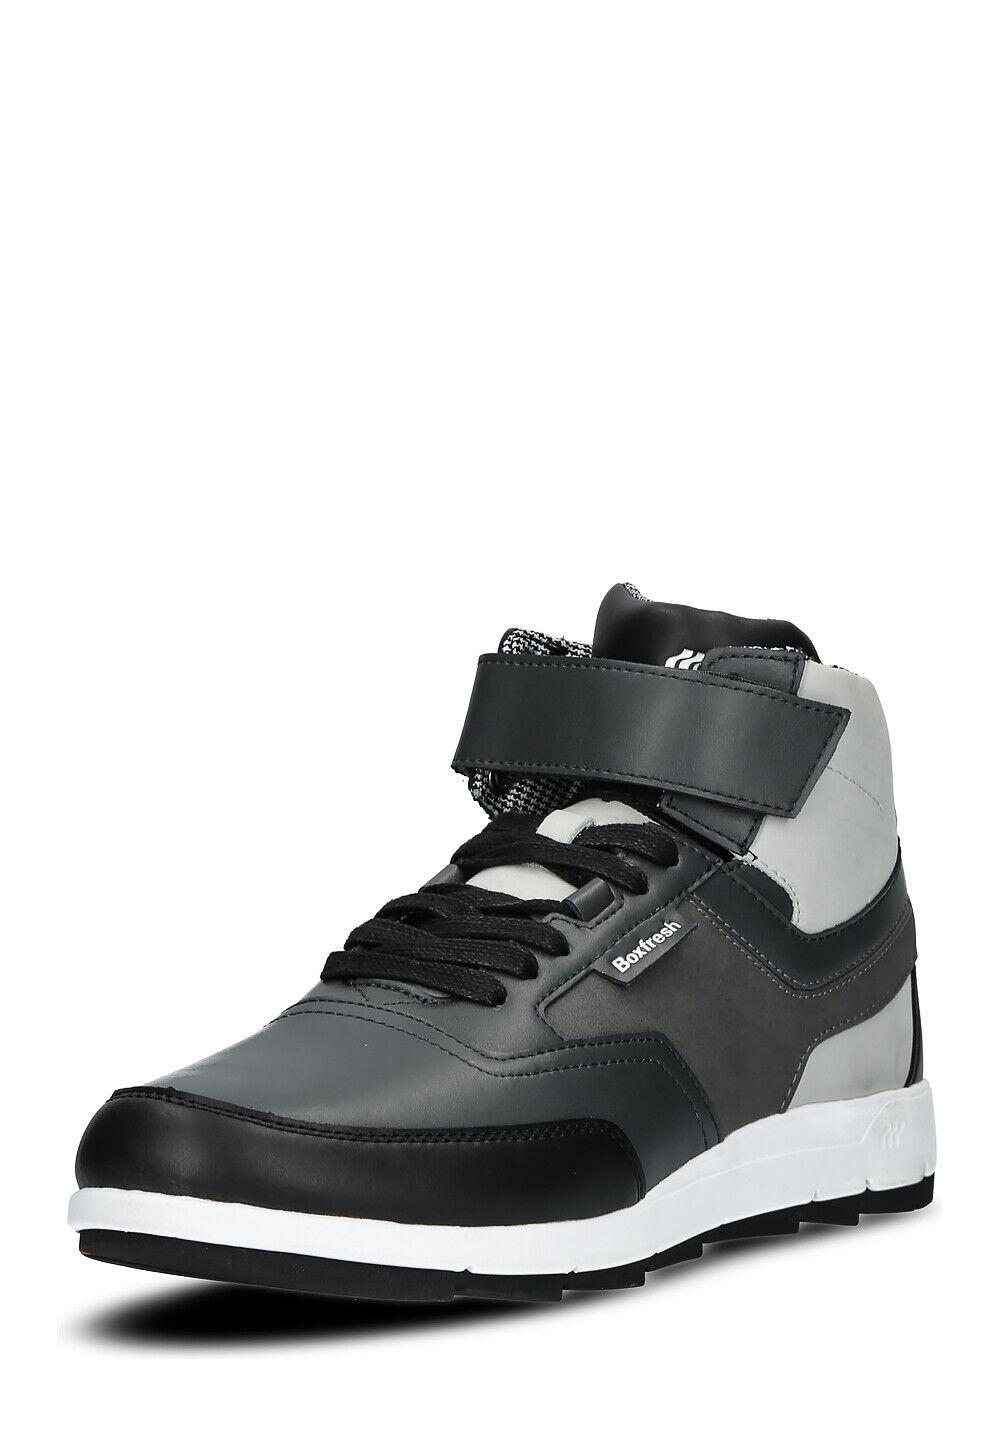 Boxfresh Herren Schuhe Turnschuhe echtem Leder Größe 42 43